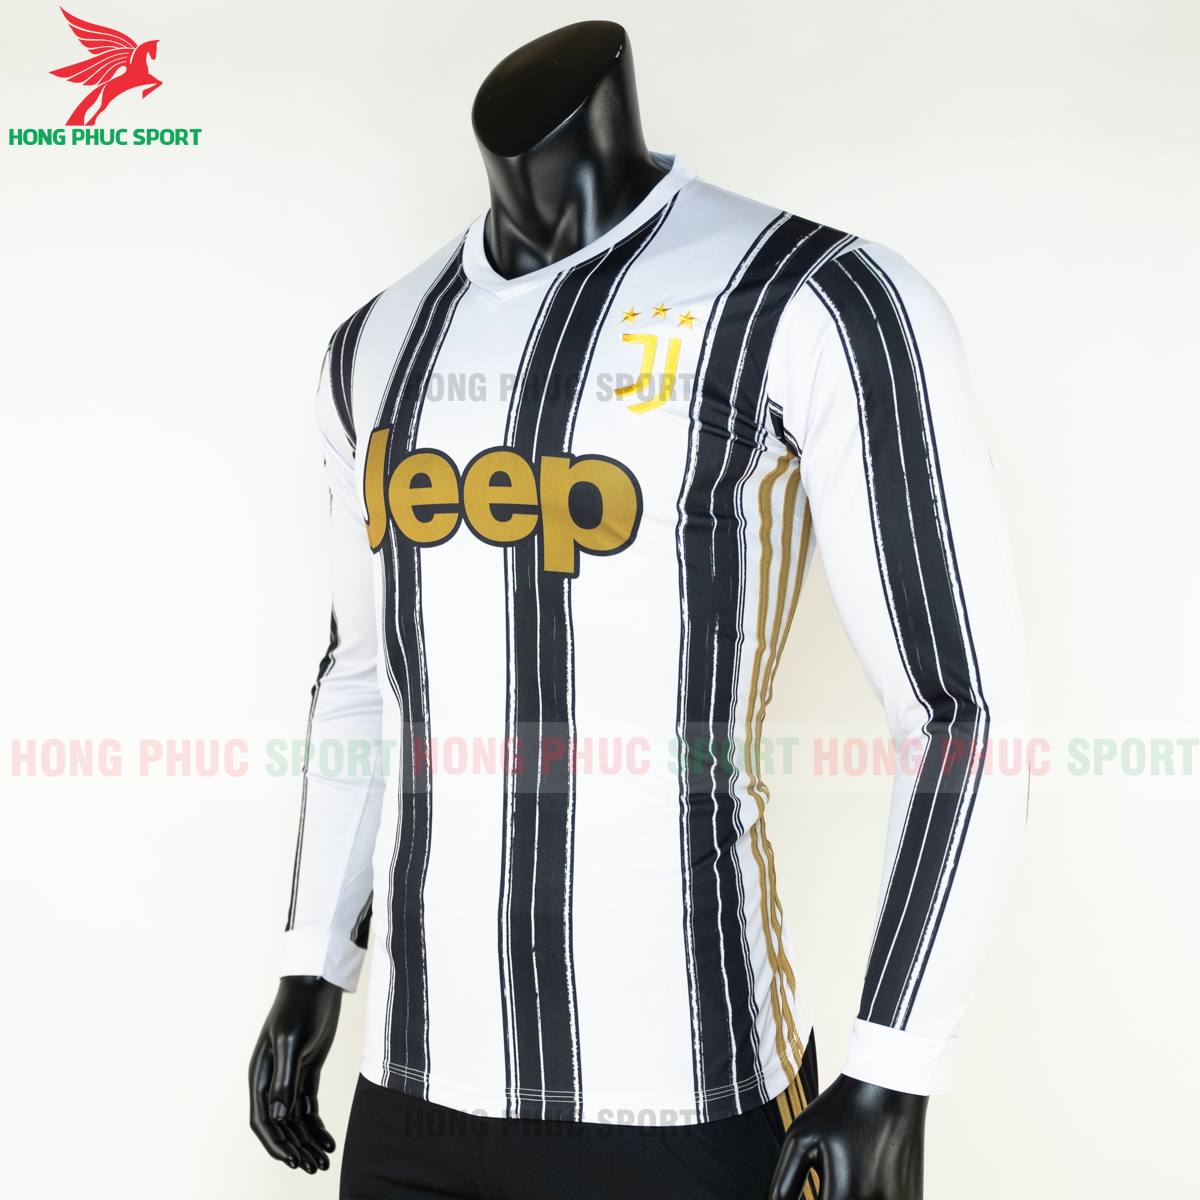 https://cdn.hongphucsport.com/unsafe/s4.shopbay.vn/files/285/ao-dai-tay-juventus-2020-san-nha-3-5f8fbddbb821a.png